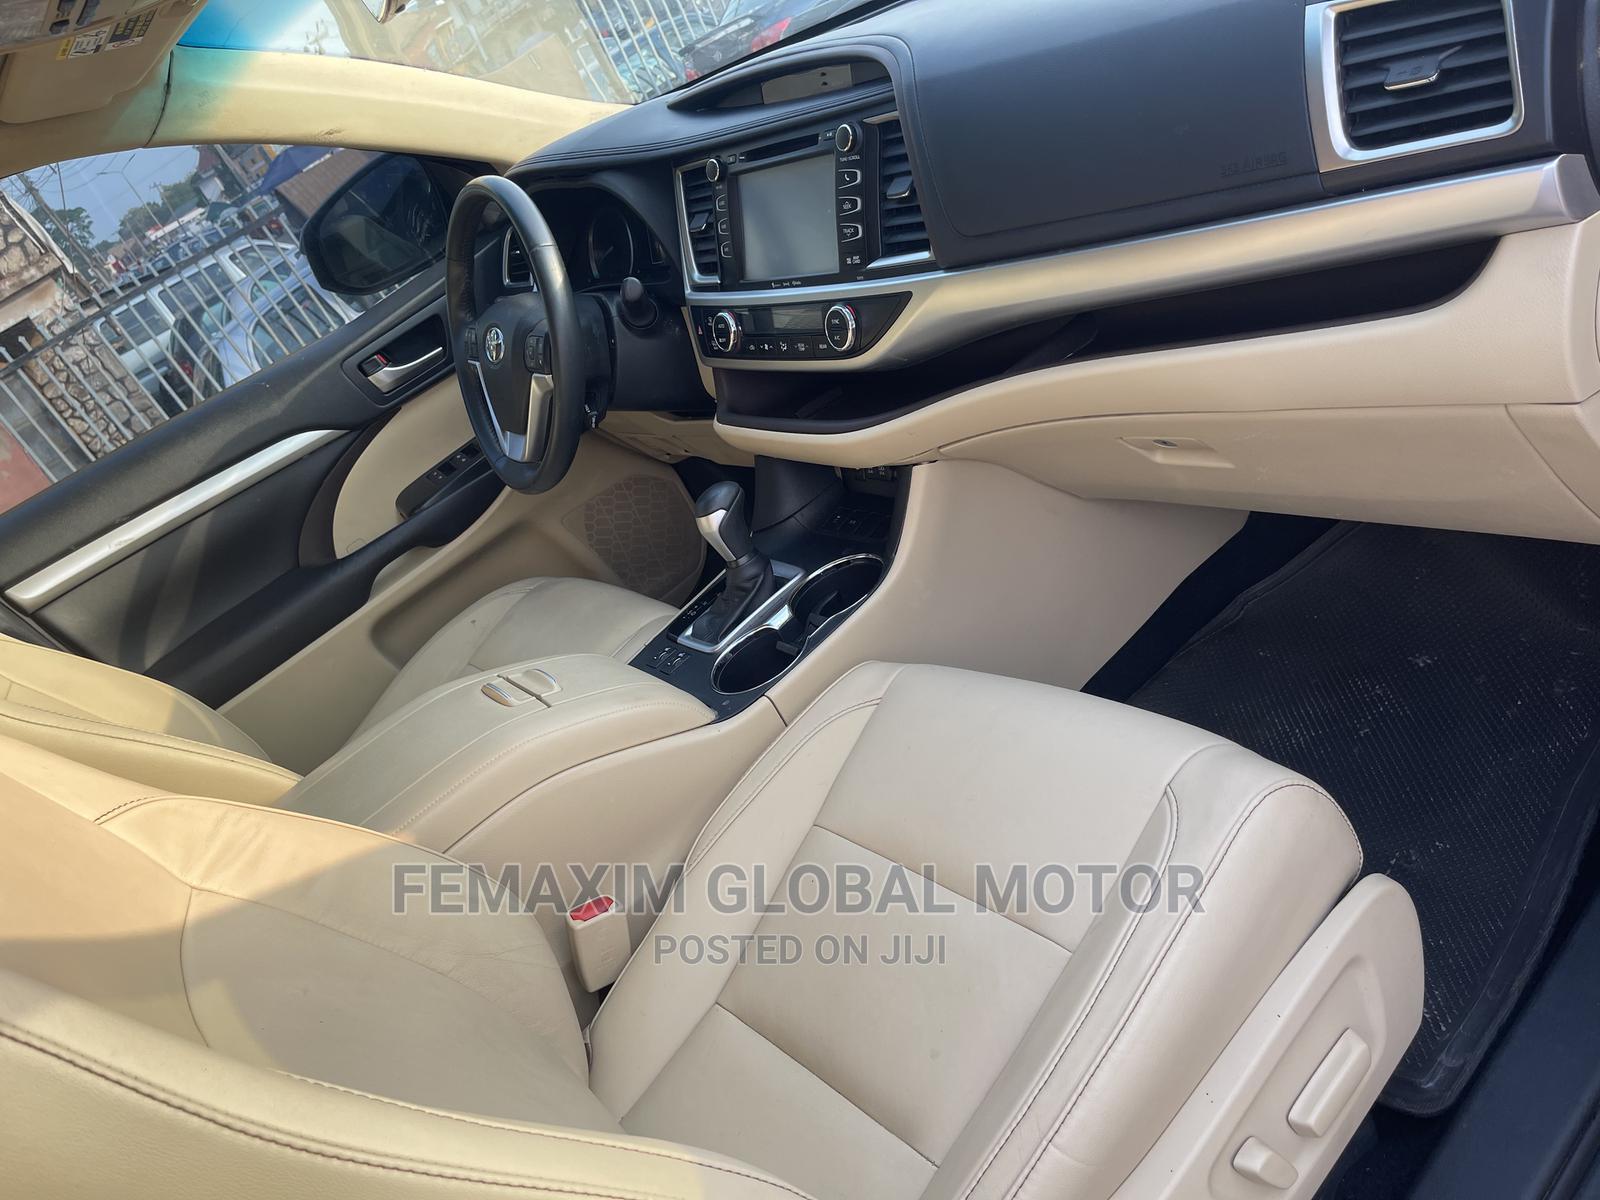 Toyota Highlander 2017 XLE 4x4 V6 (3.5L 6cyl 8A) Brown | Cars for sale in Ibadan, Oyo State, Nigeria